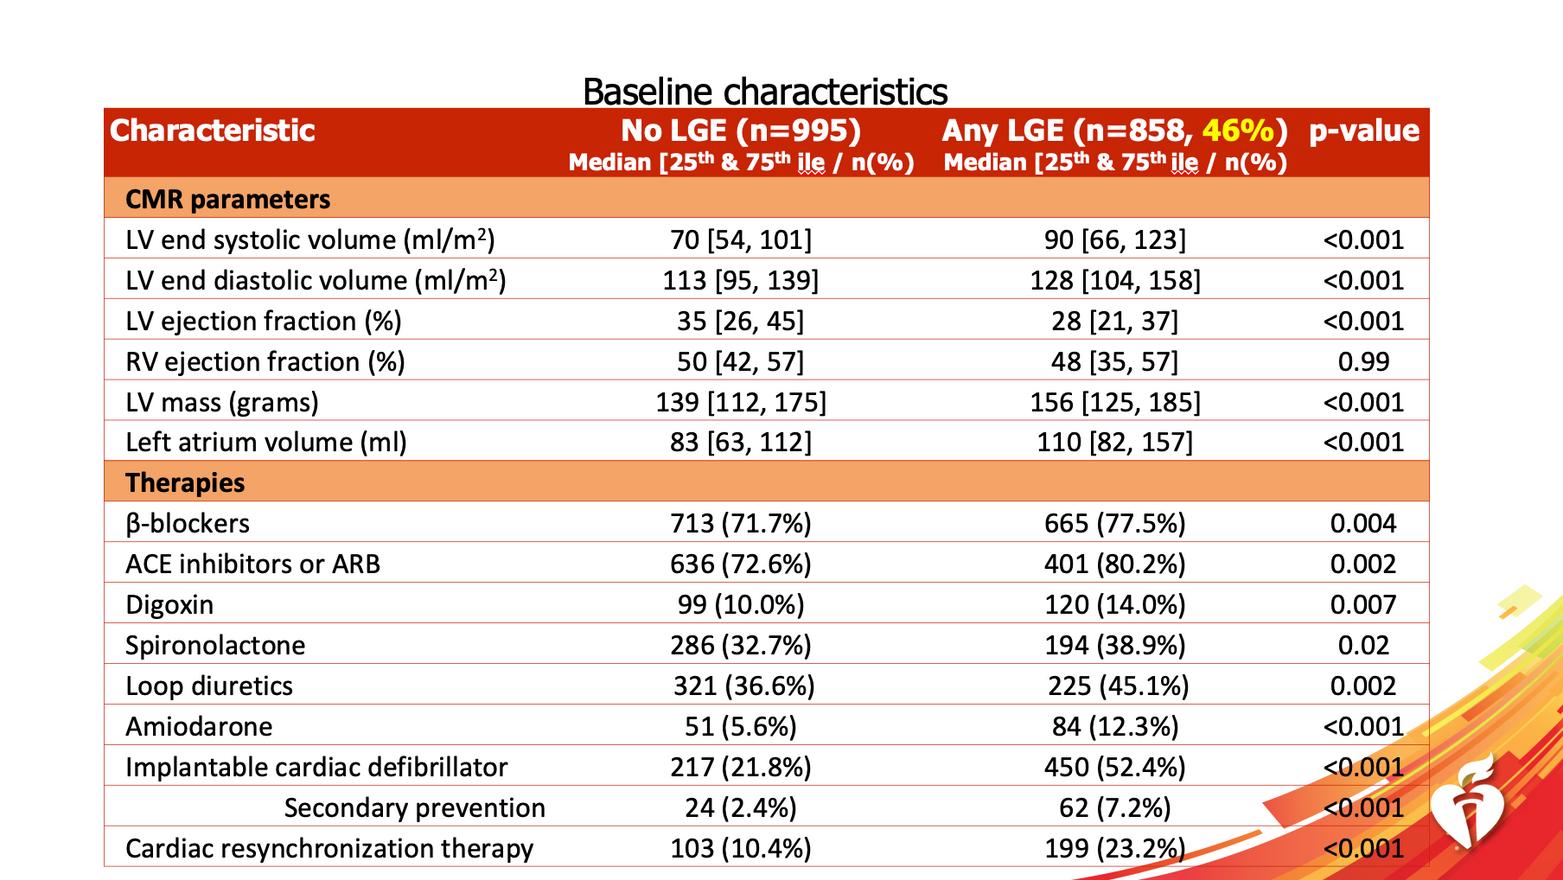 CMR characteristics